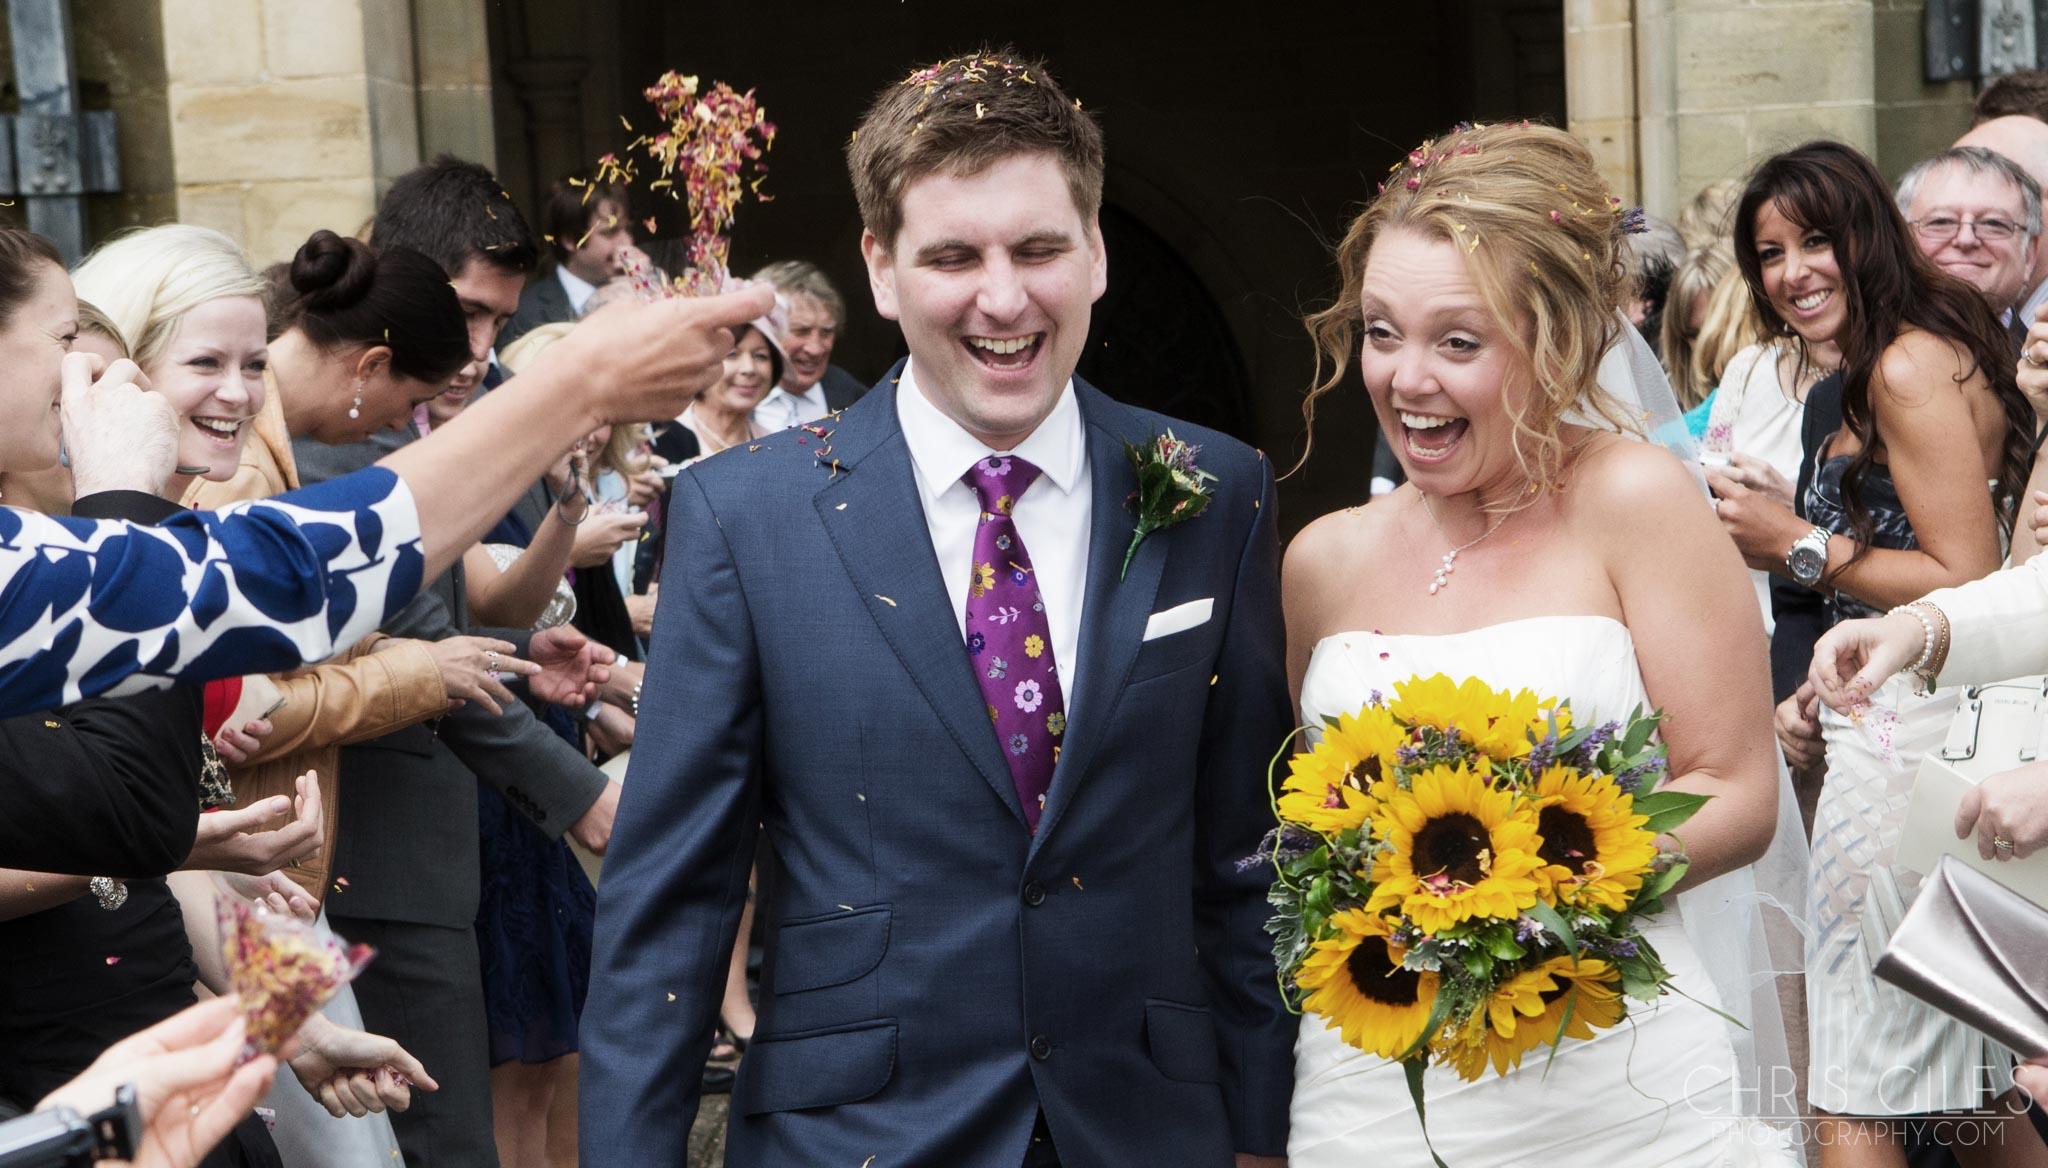 Lancing College Chapel Wedding